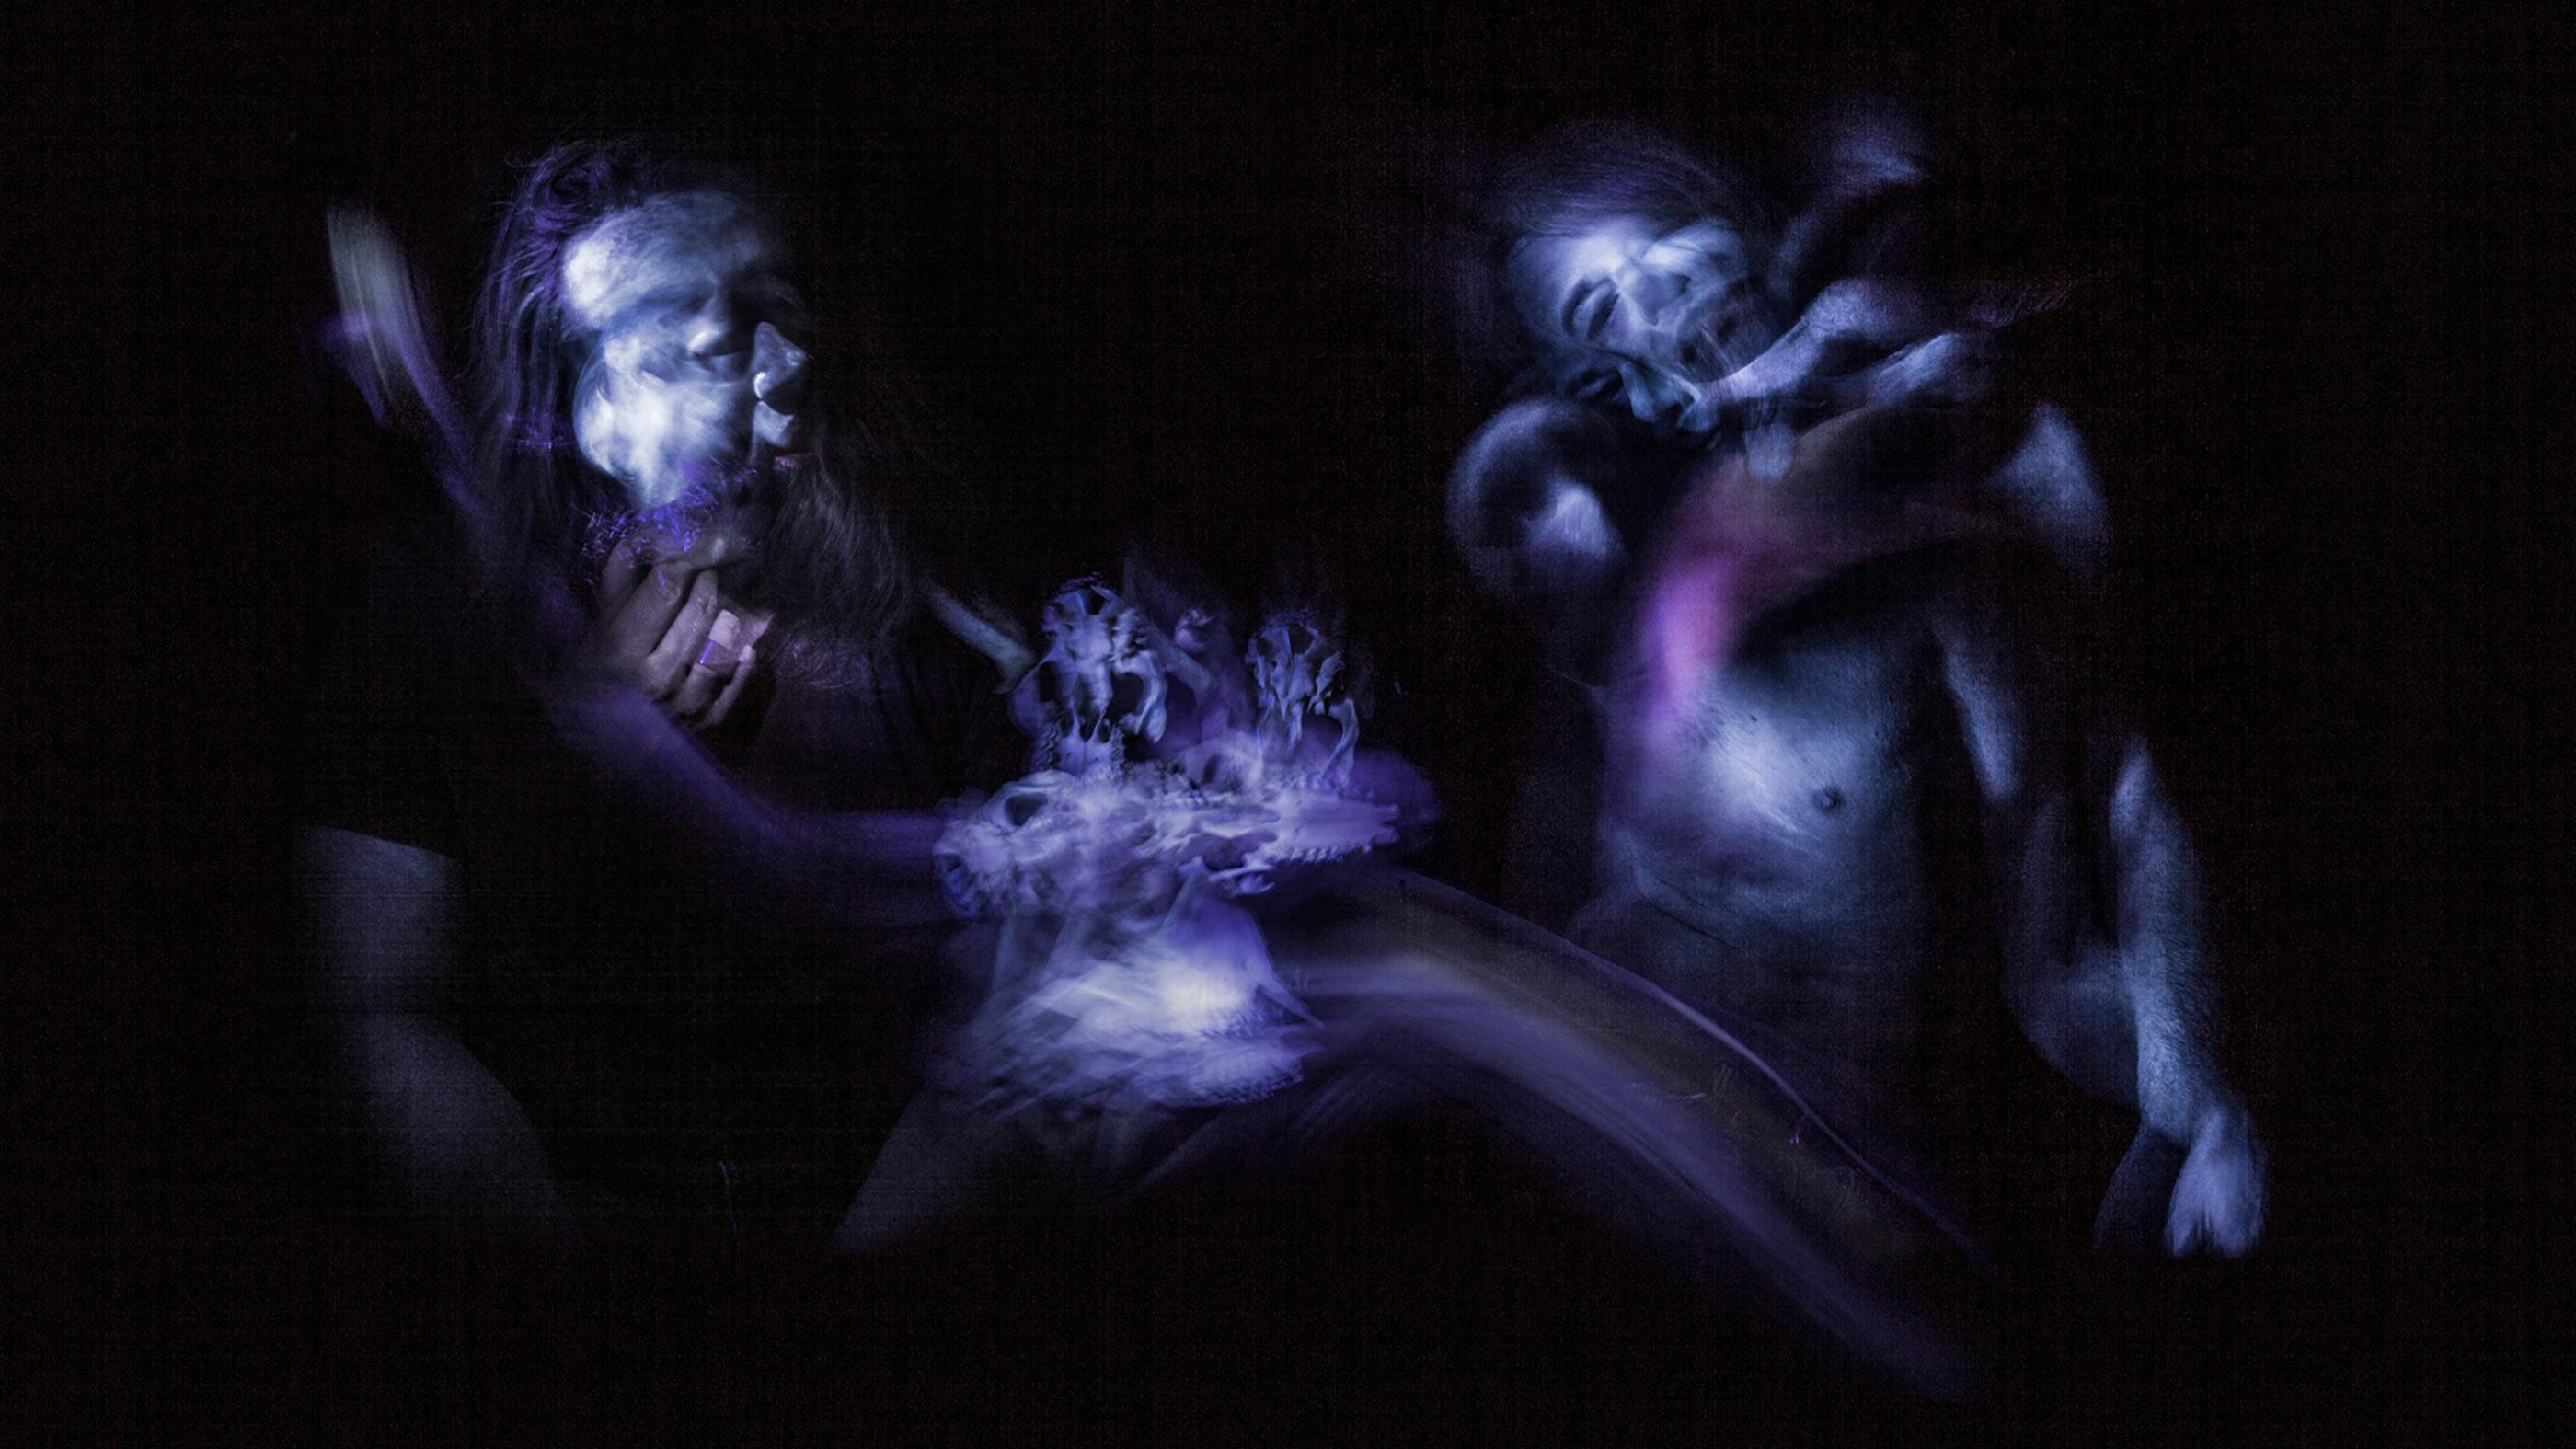 David-le-Viseur_Michael-Pfitzner_Illumination_Talk